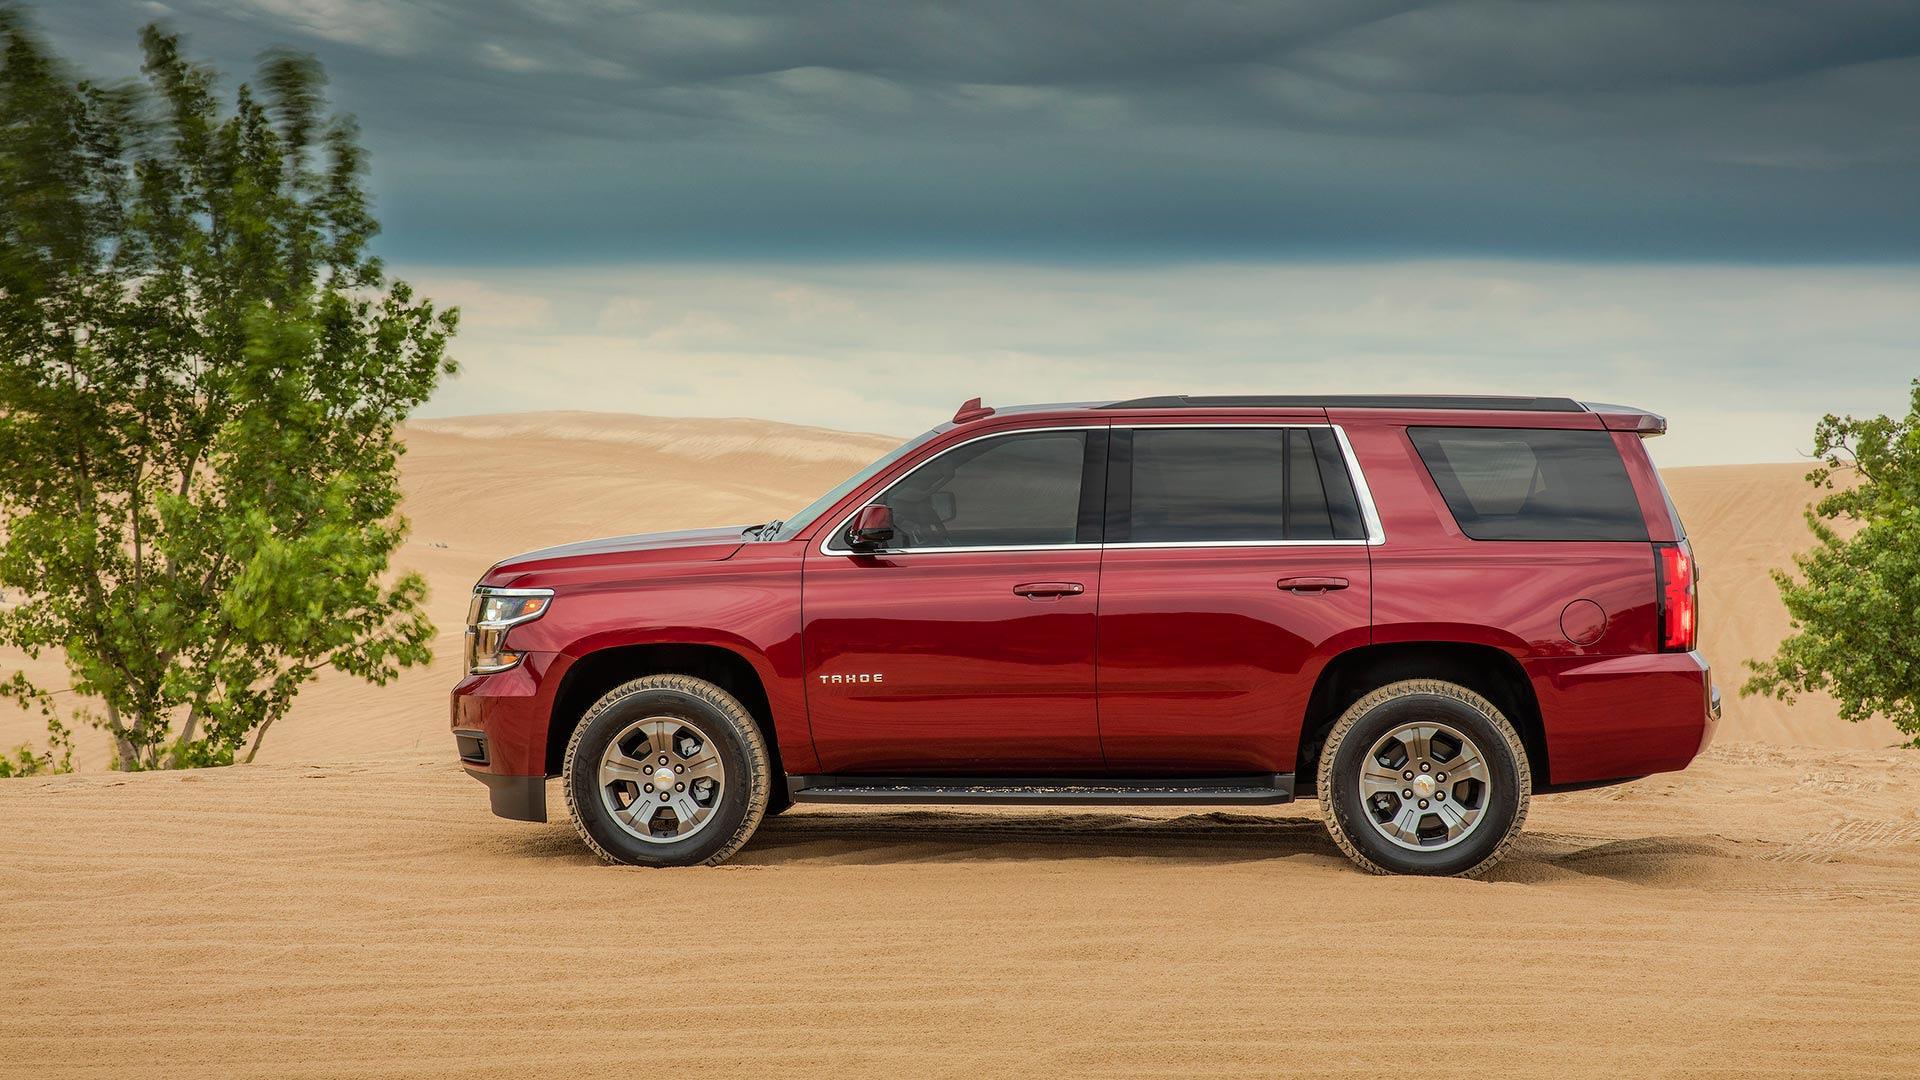 Custom Chevy Tahoe >> Chevy Launches Two Row Tahoe Custom Lowers Price To 45k